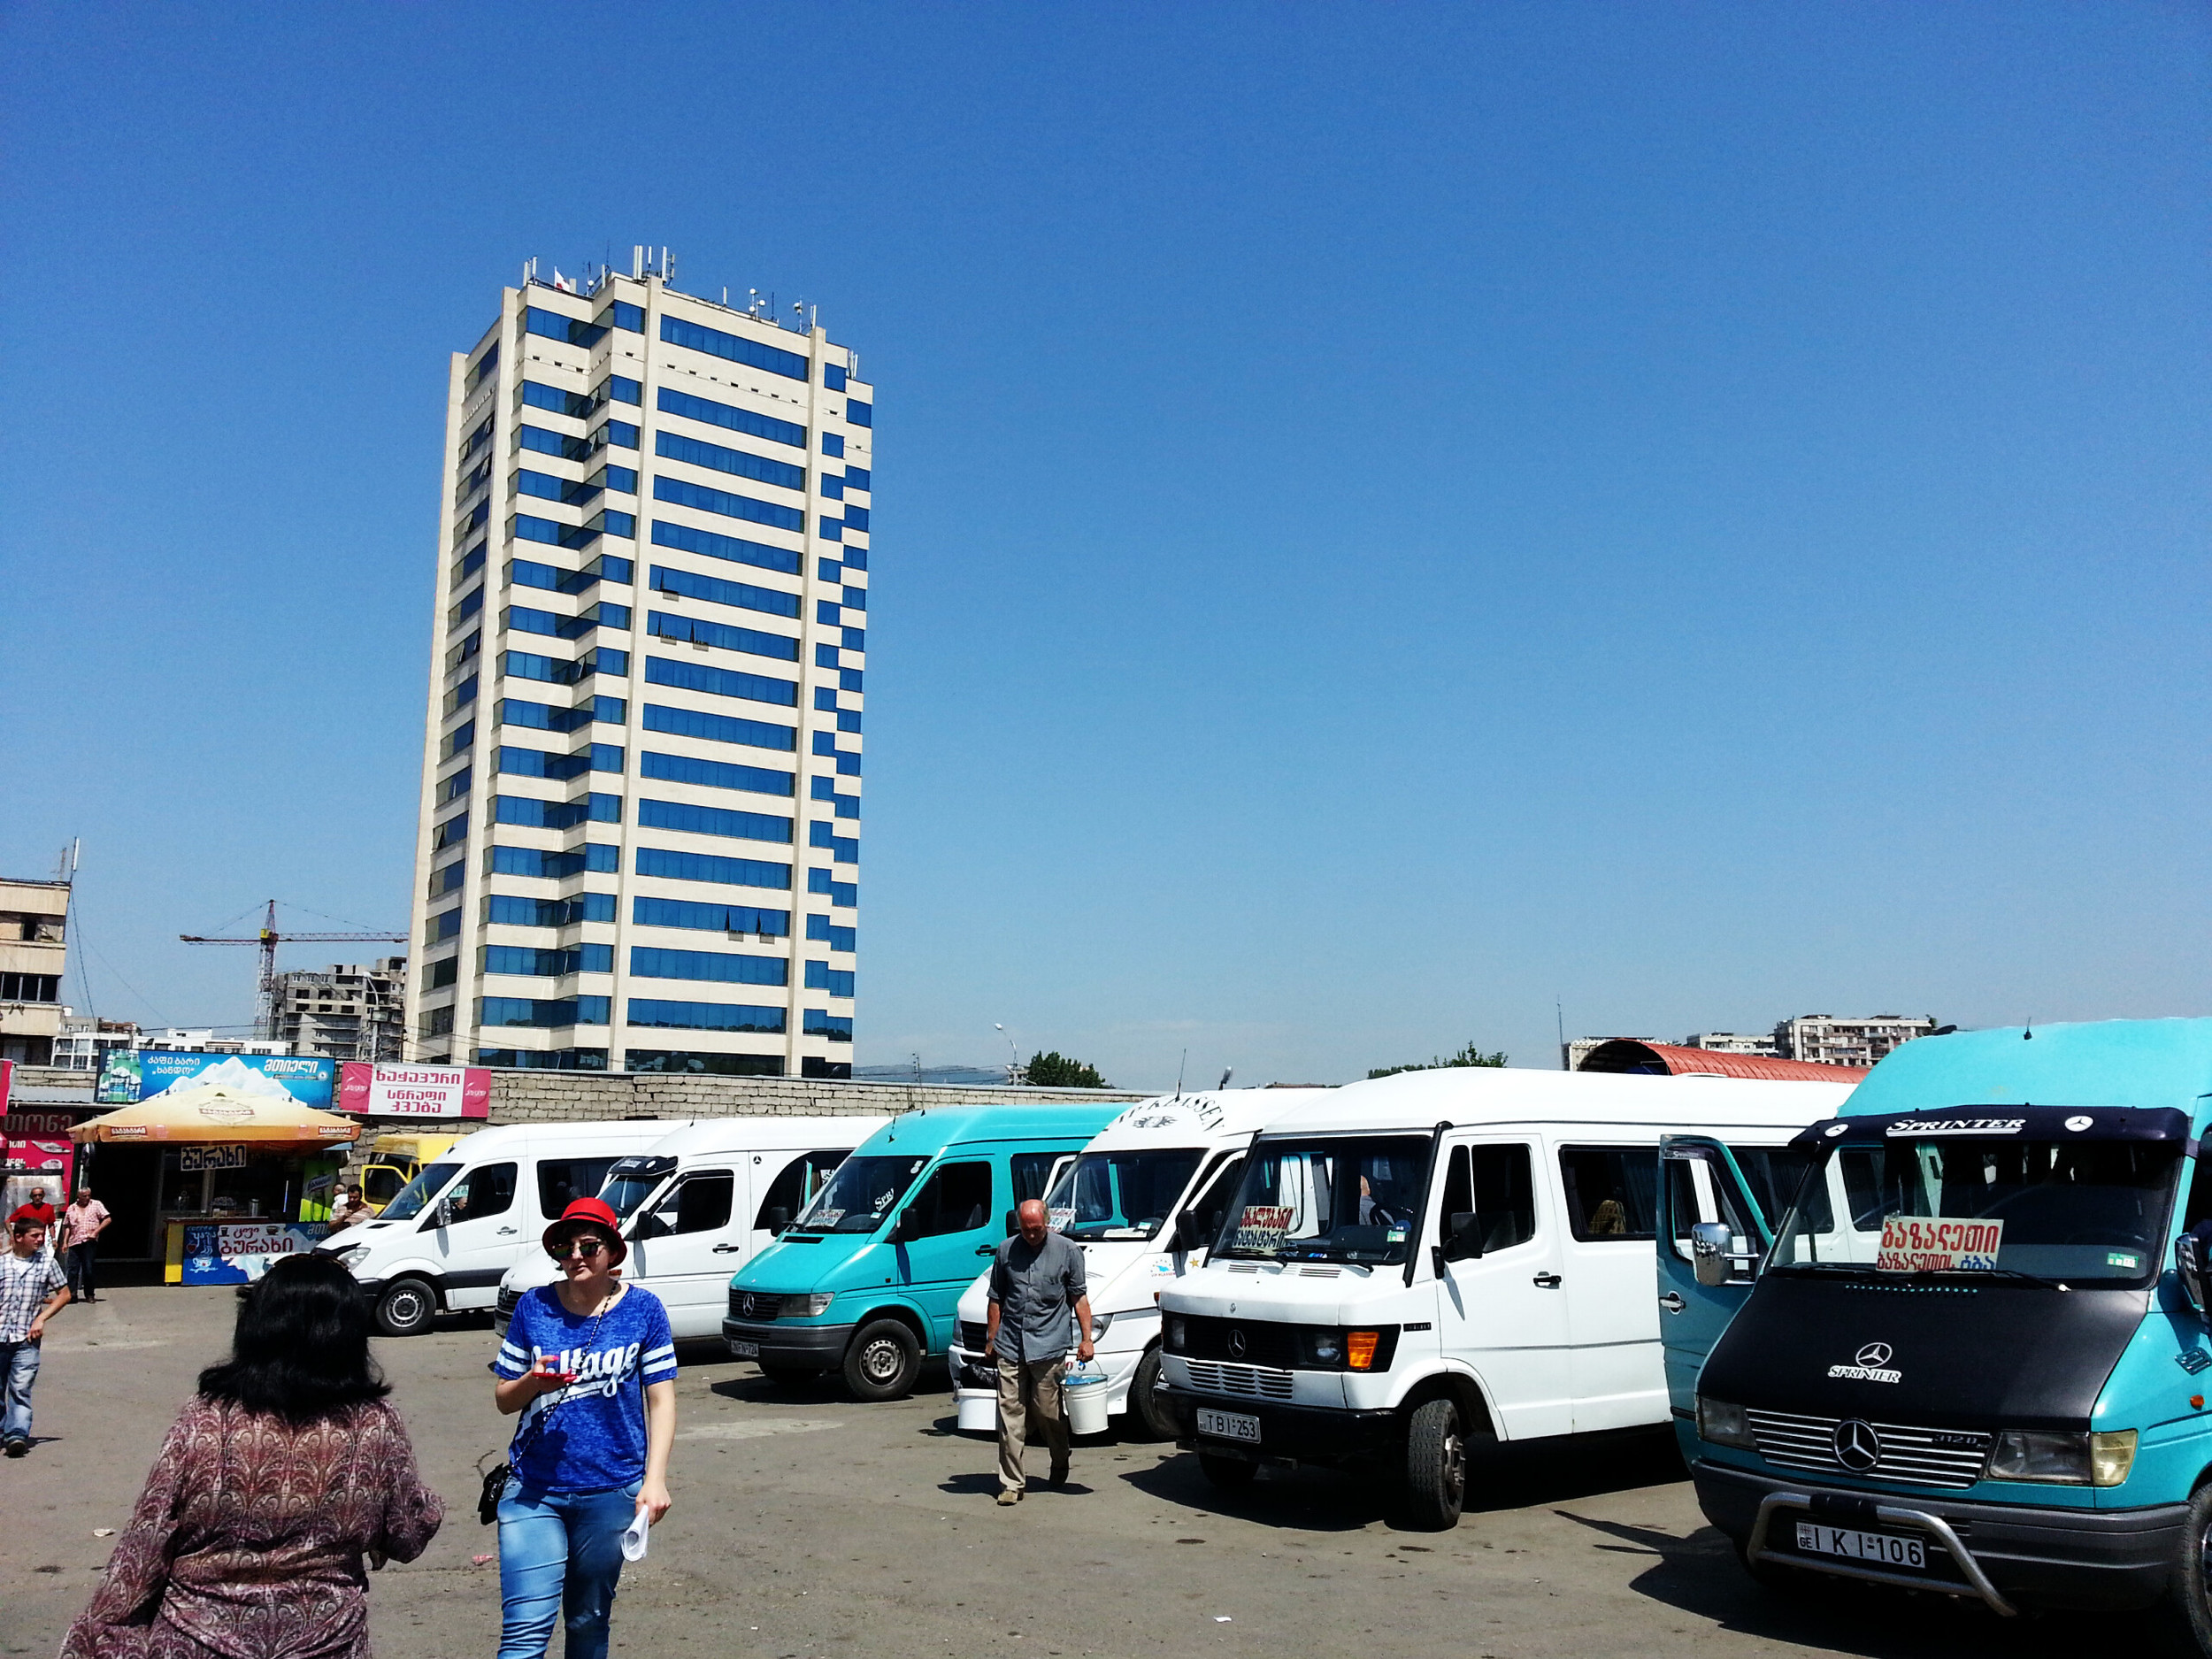 Tbilisi,Didube bus station.  Most minibus destination signs are in Georgian...